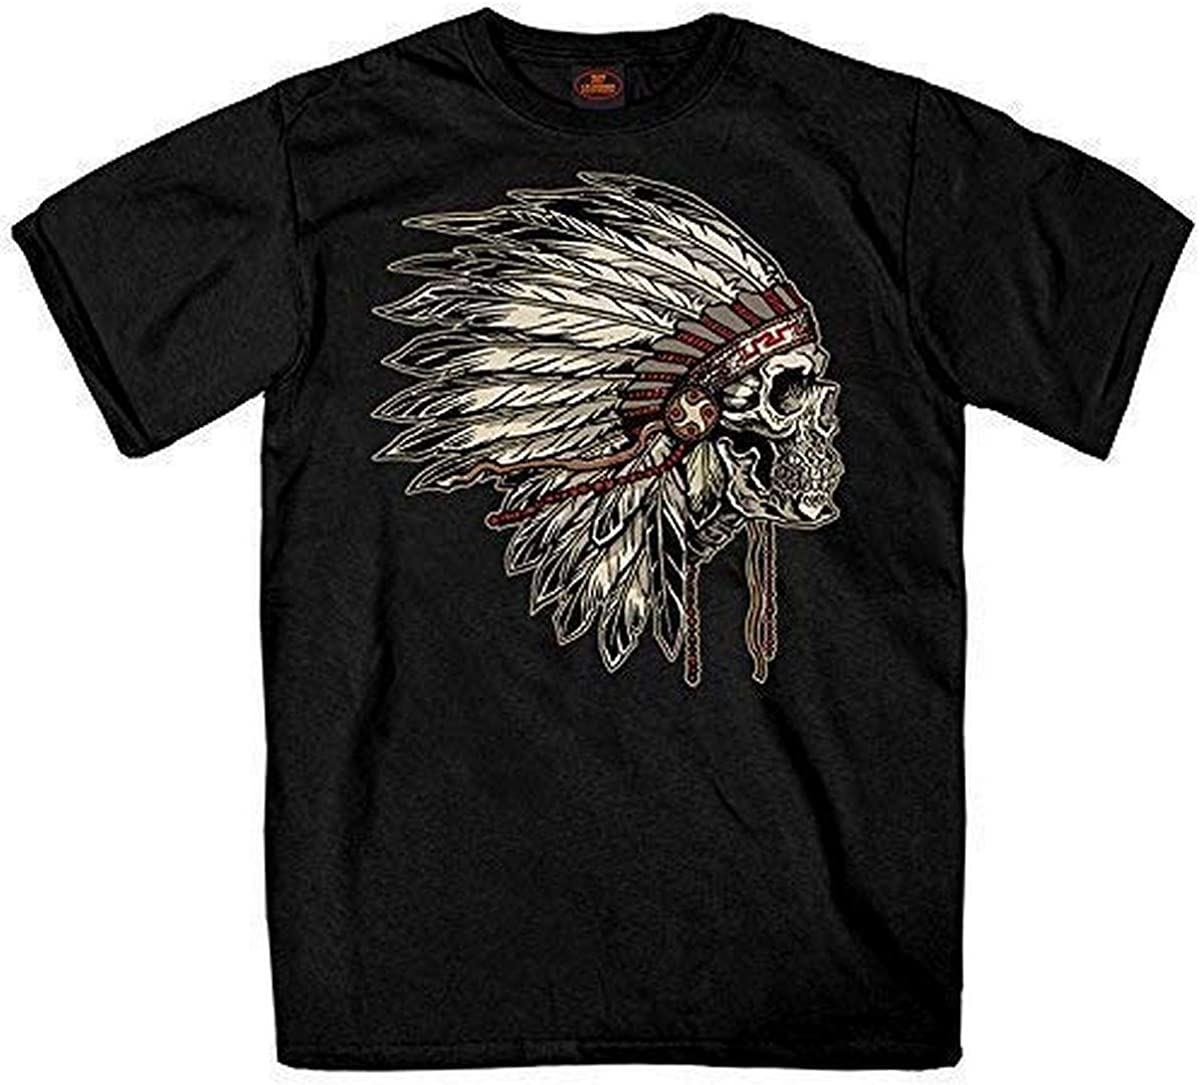 Hot Leathers Earthtones Headdress 1% Cotton Double Sided Printed Biker T-Shirt